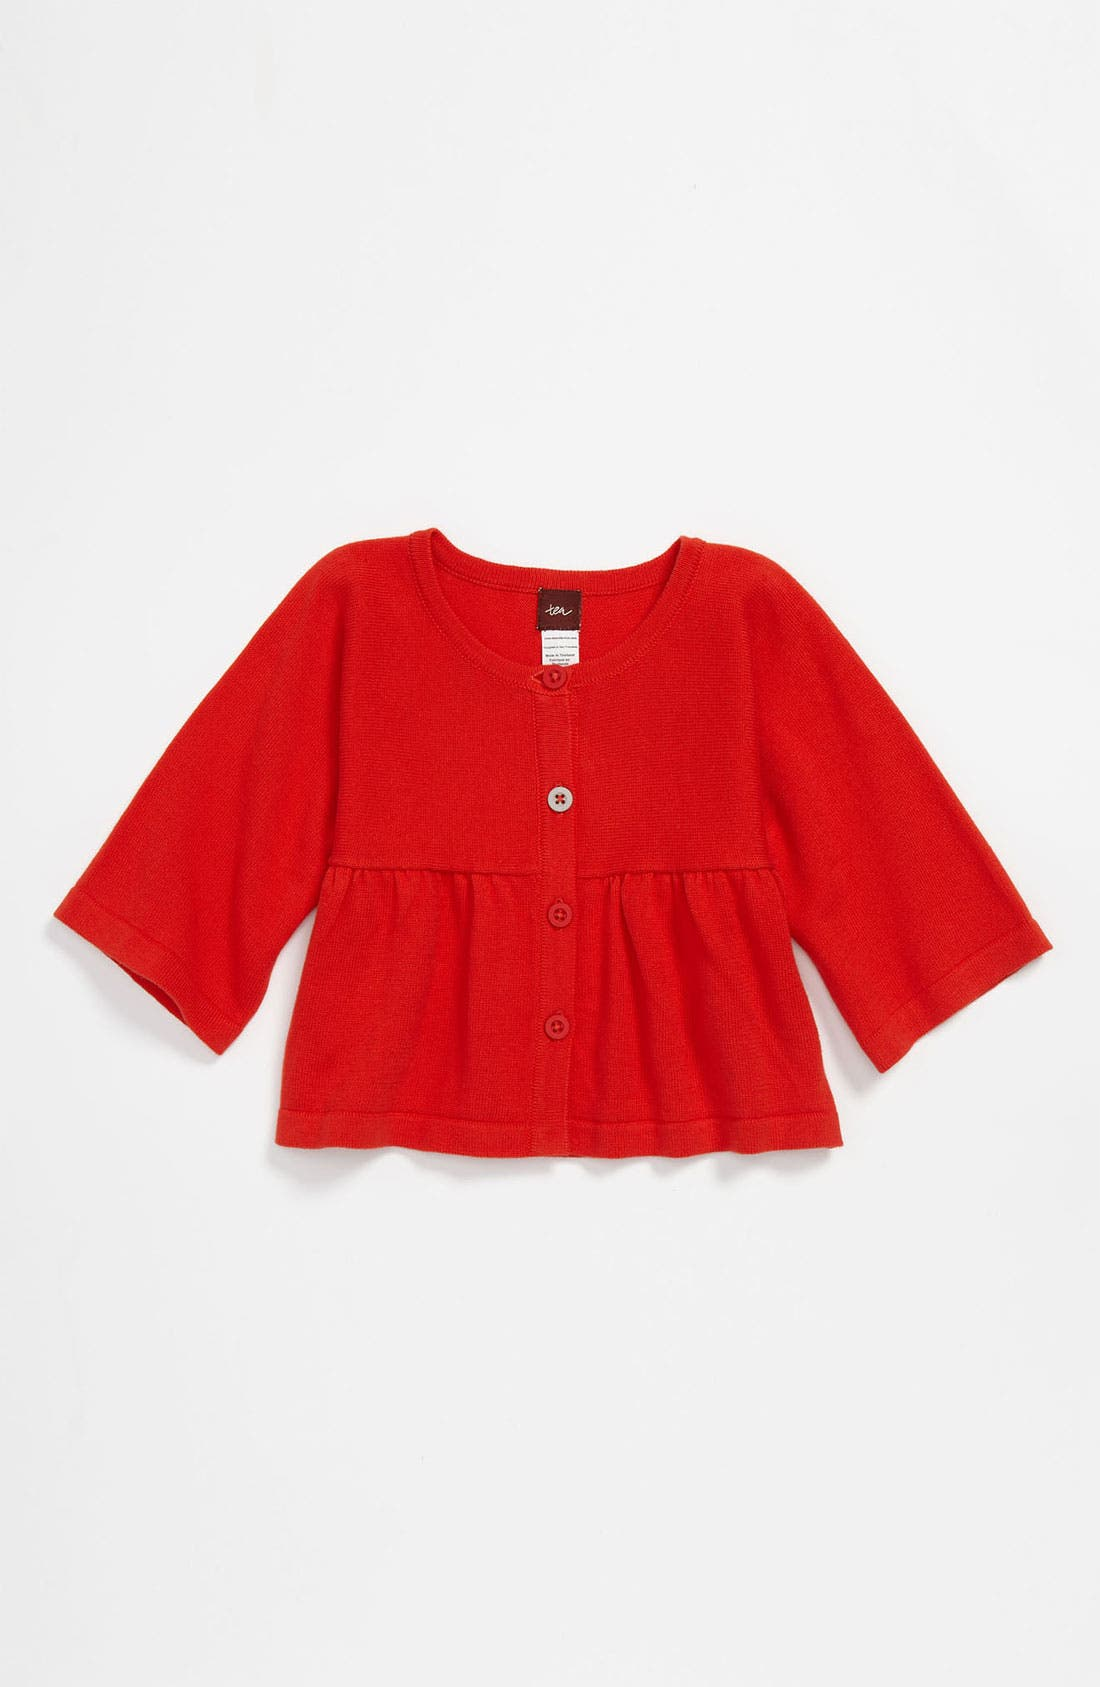 Main Image - Tea Collection 'Charming' Cardigan (Toddler)